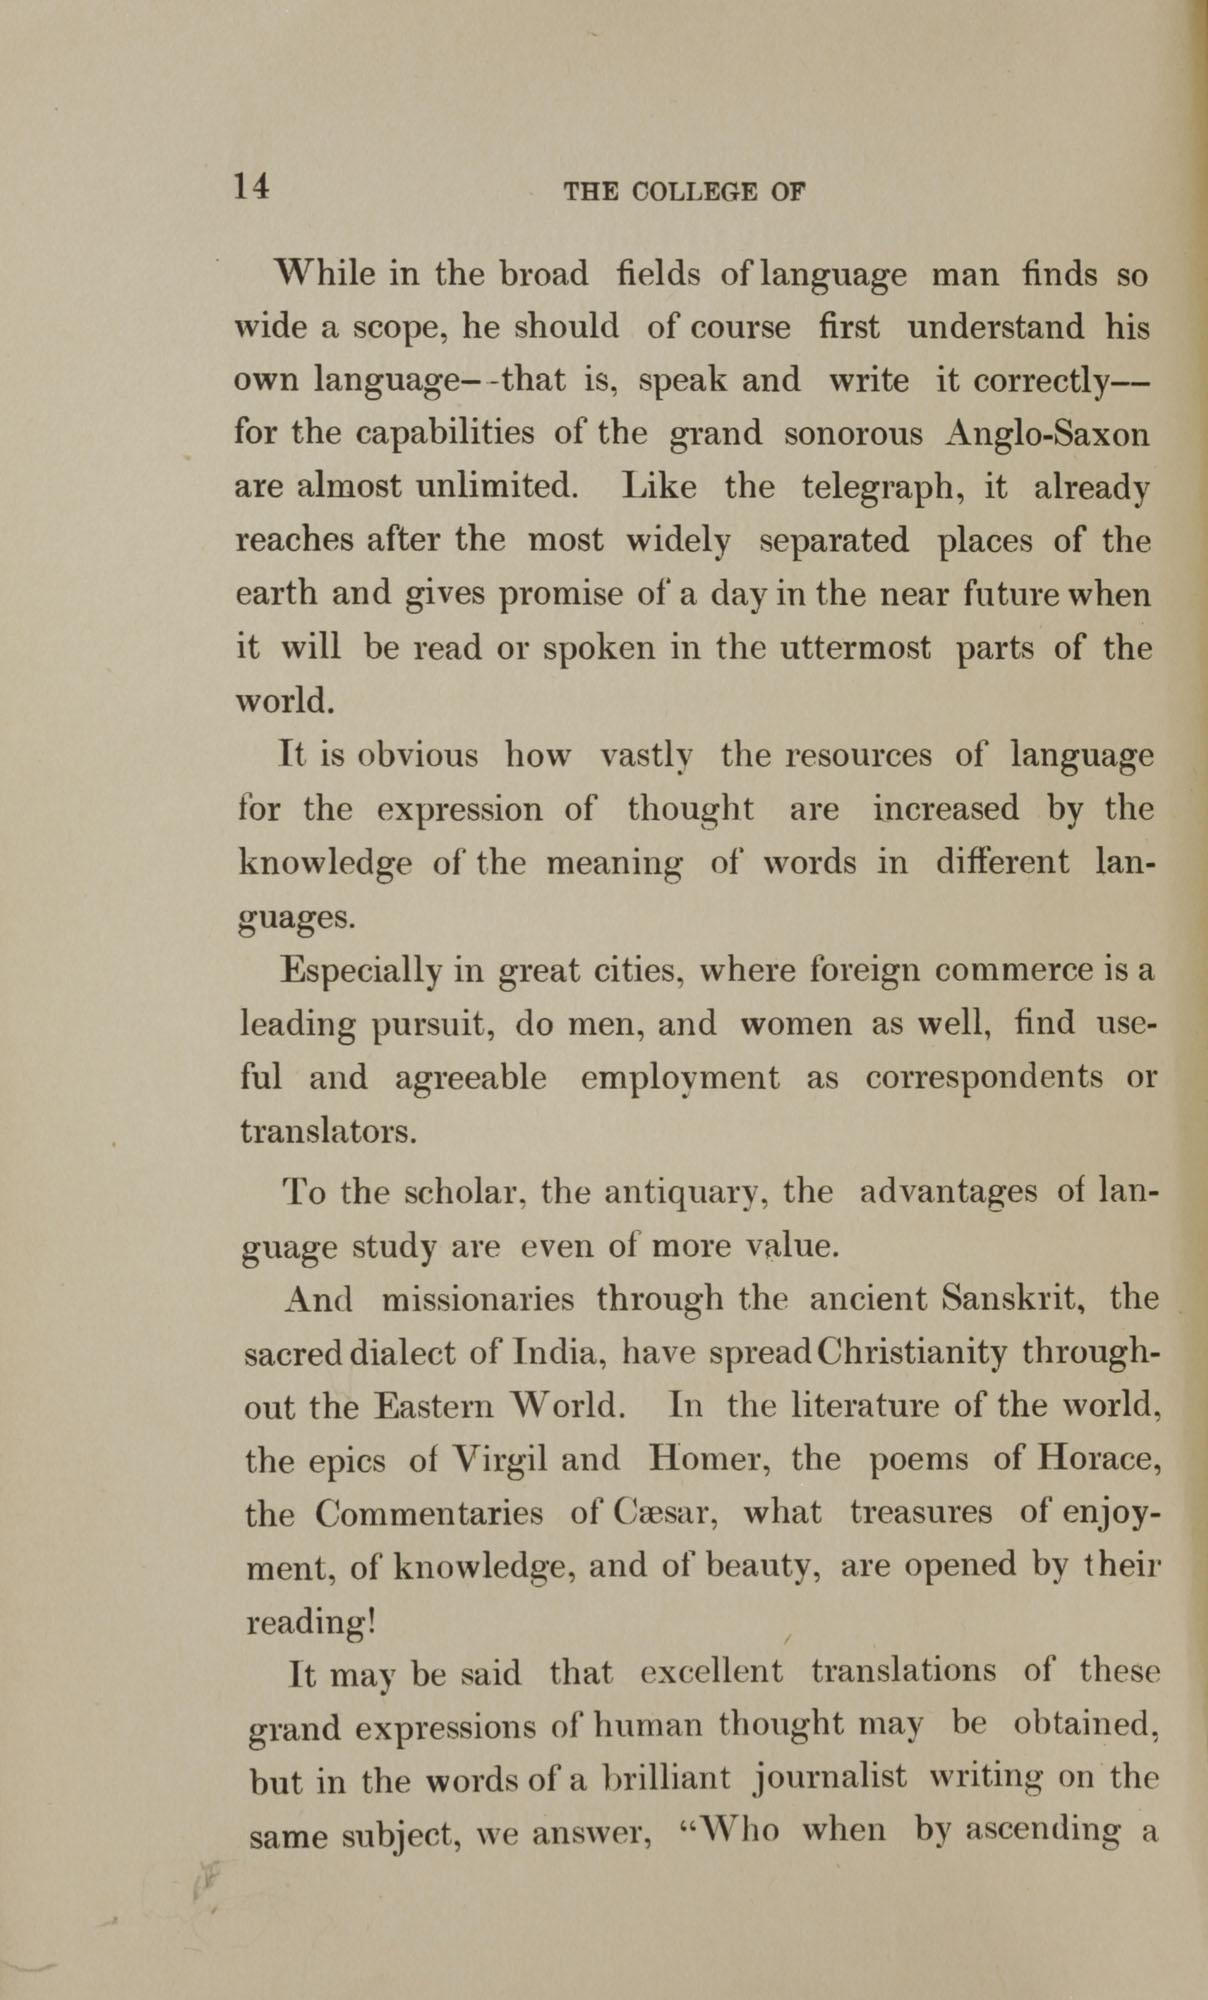 College of Charleston Magazine, 1898, Vol I. No. 1, page 14